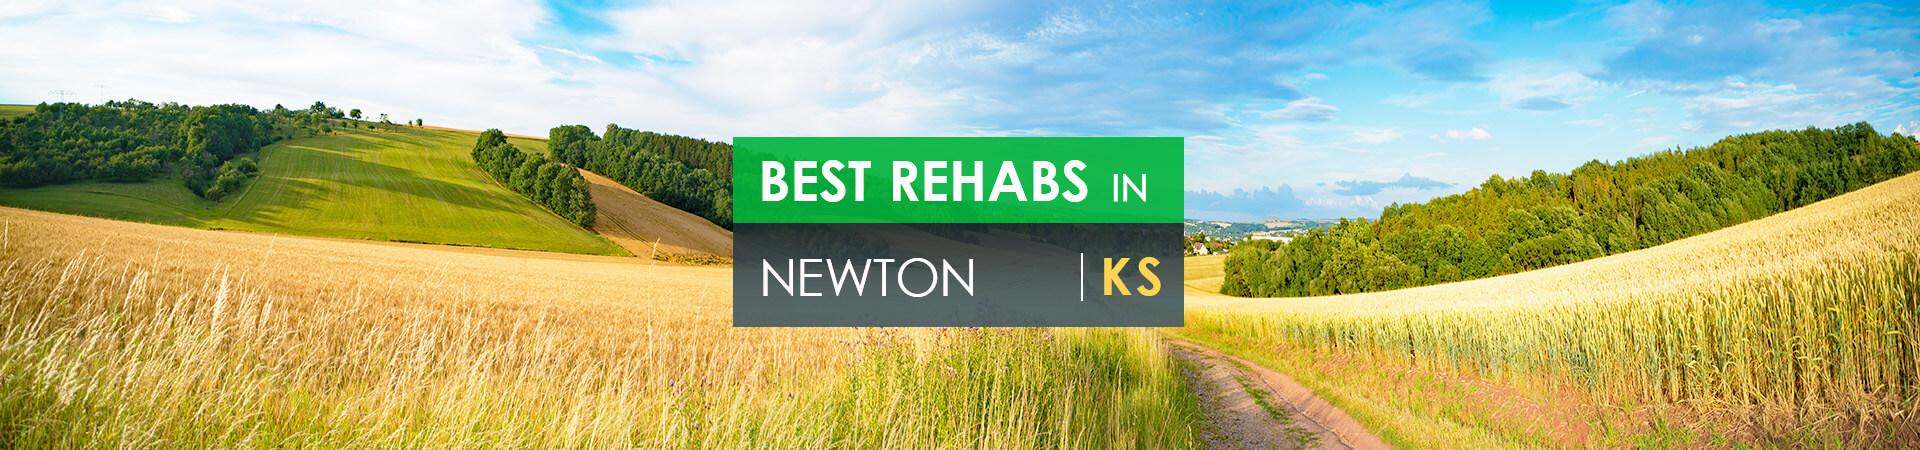 Best rehabs in Newton, KS